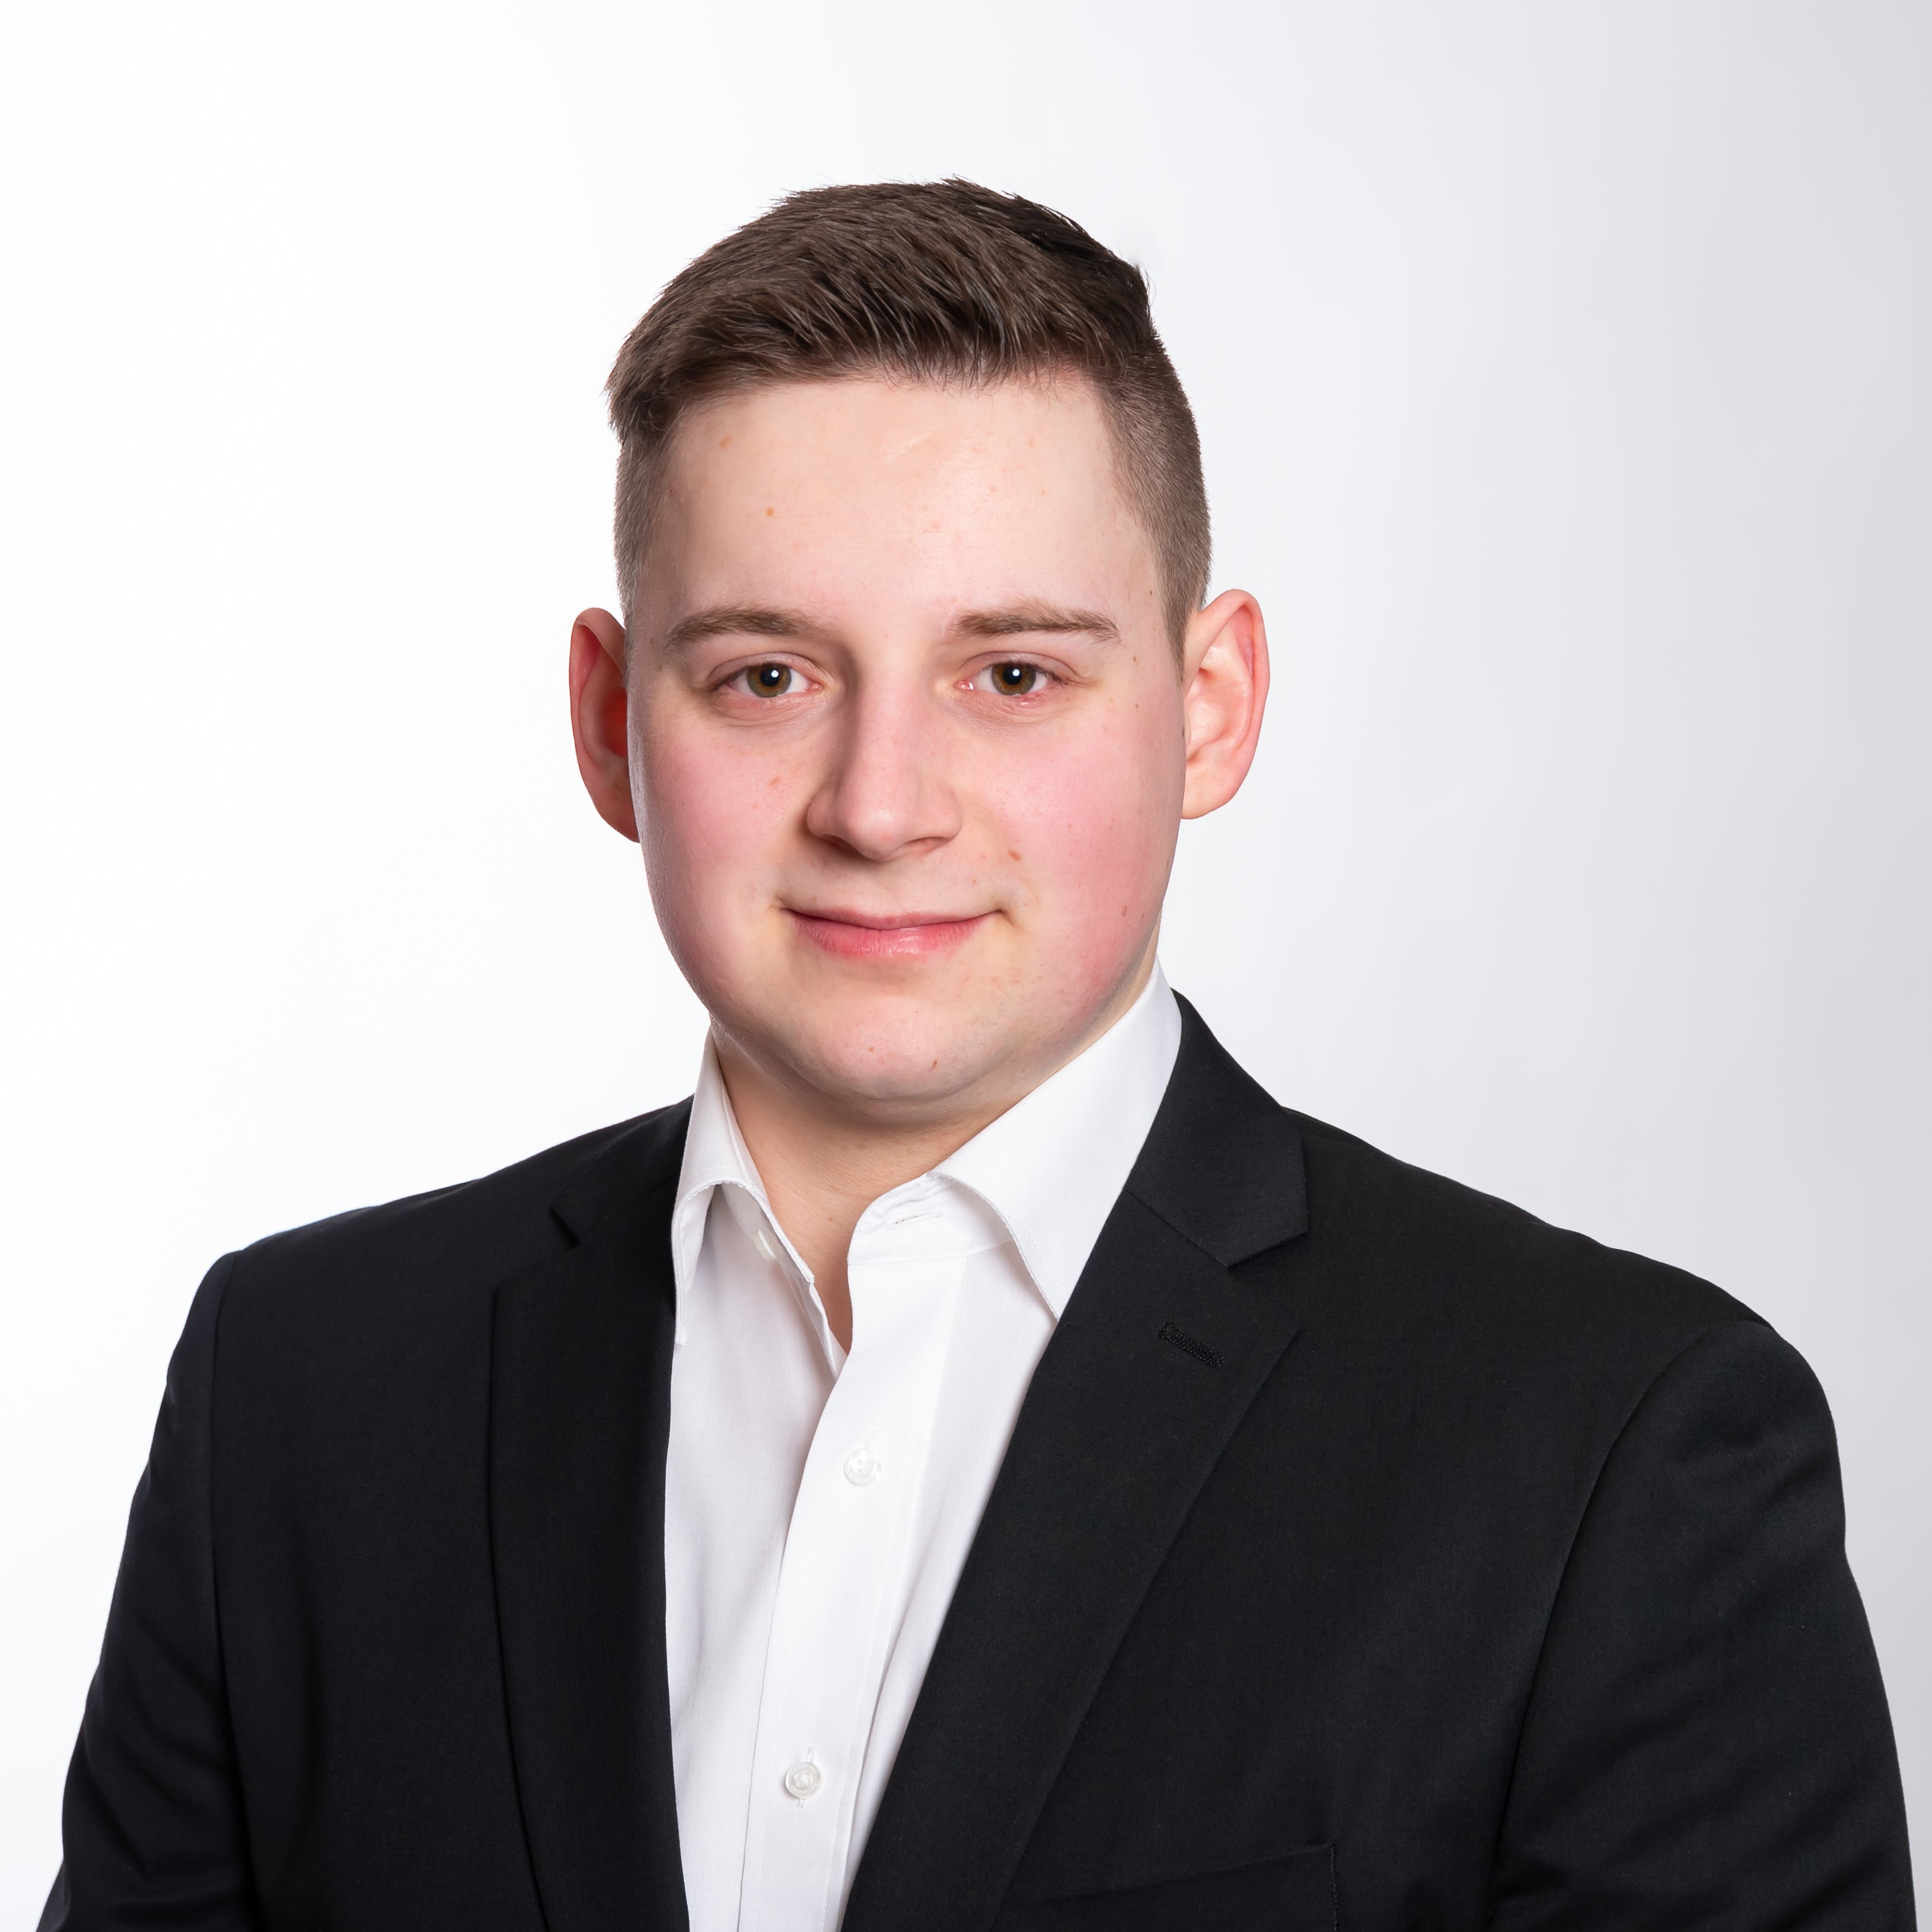 Dominik Bienz, JCVP